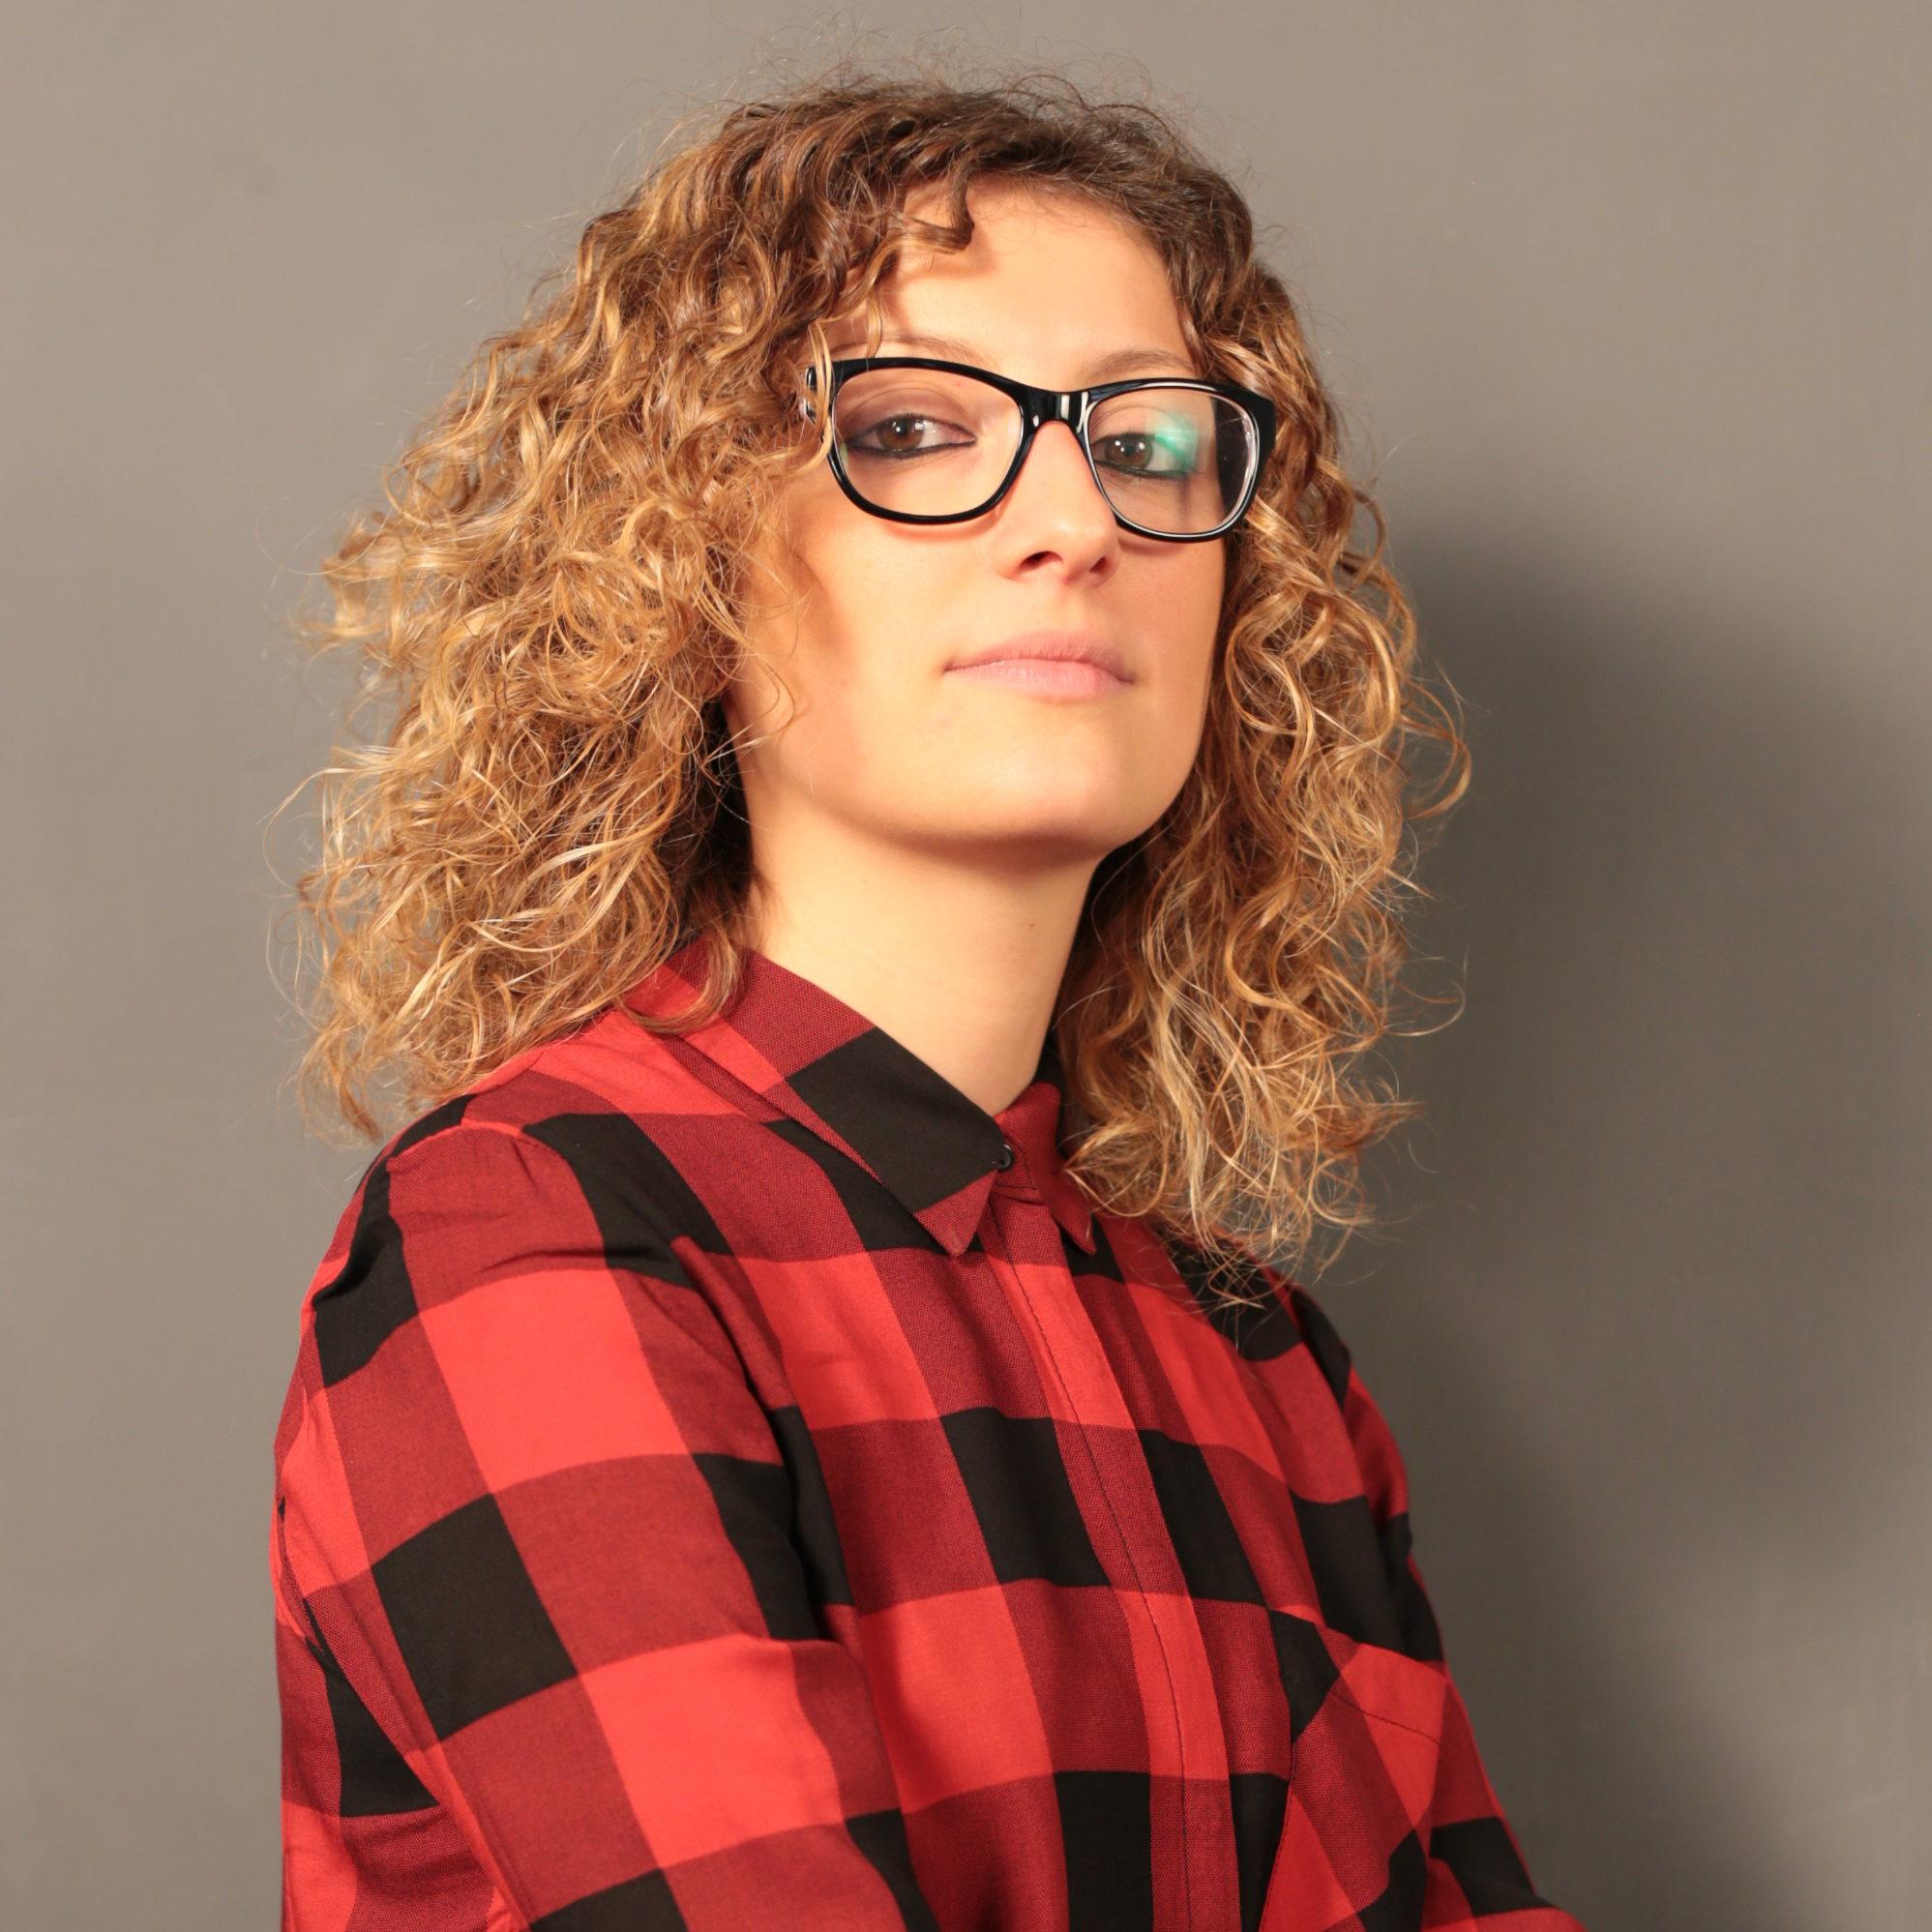 Emanuela Milana